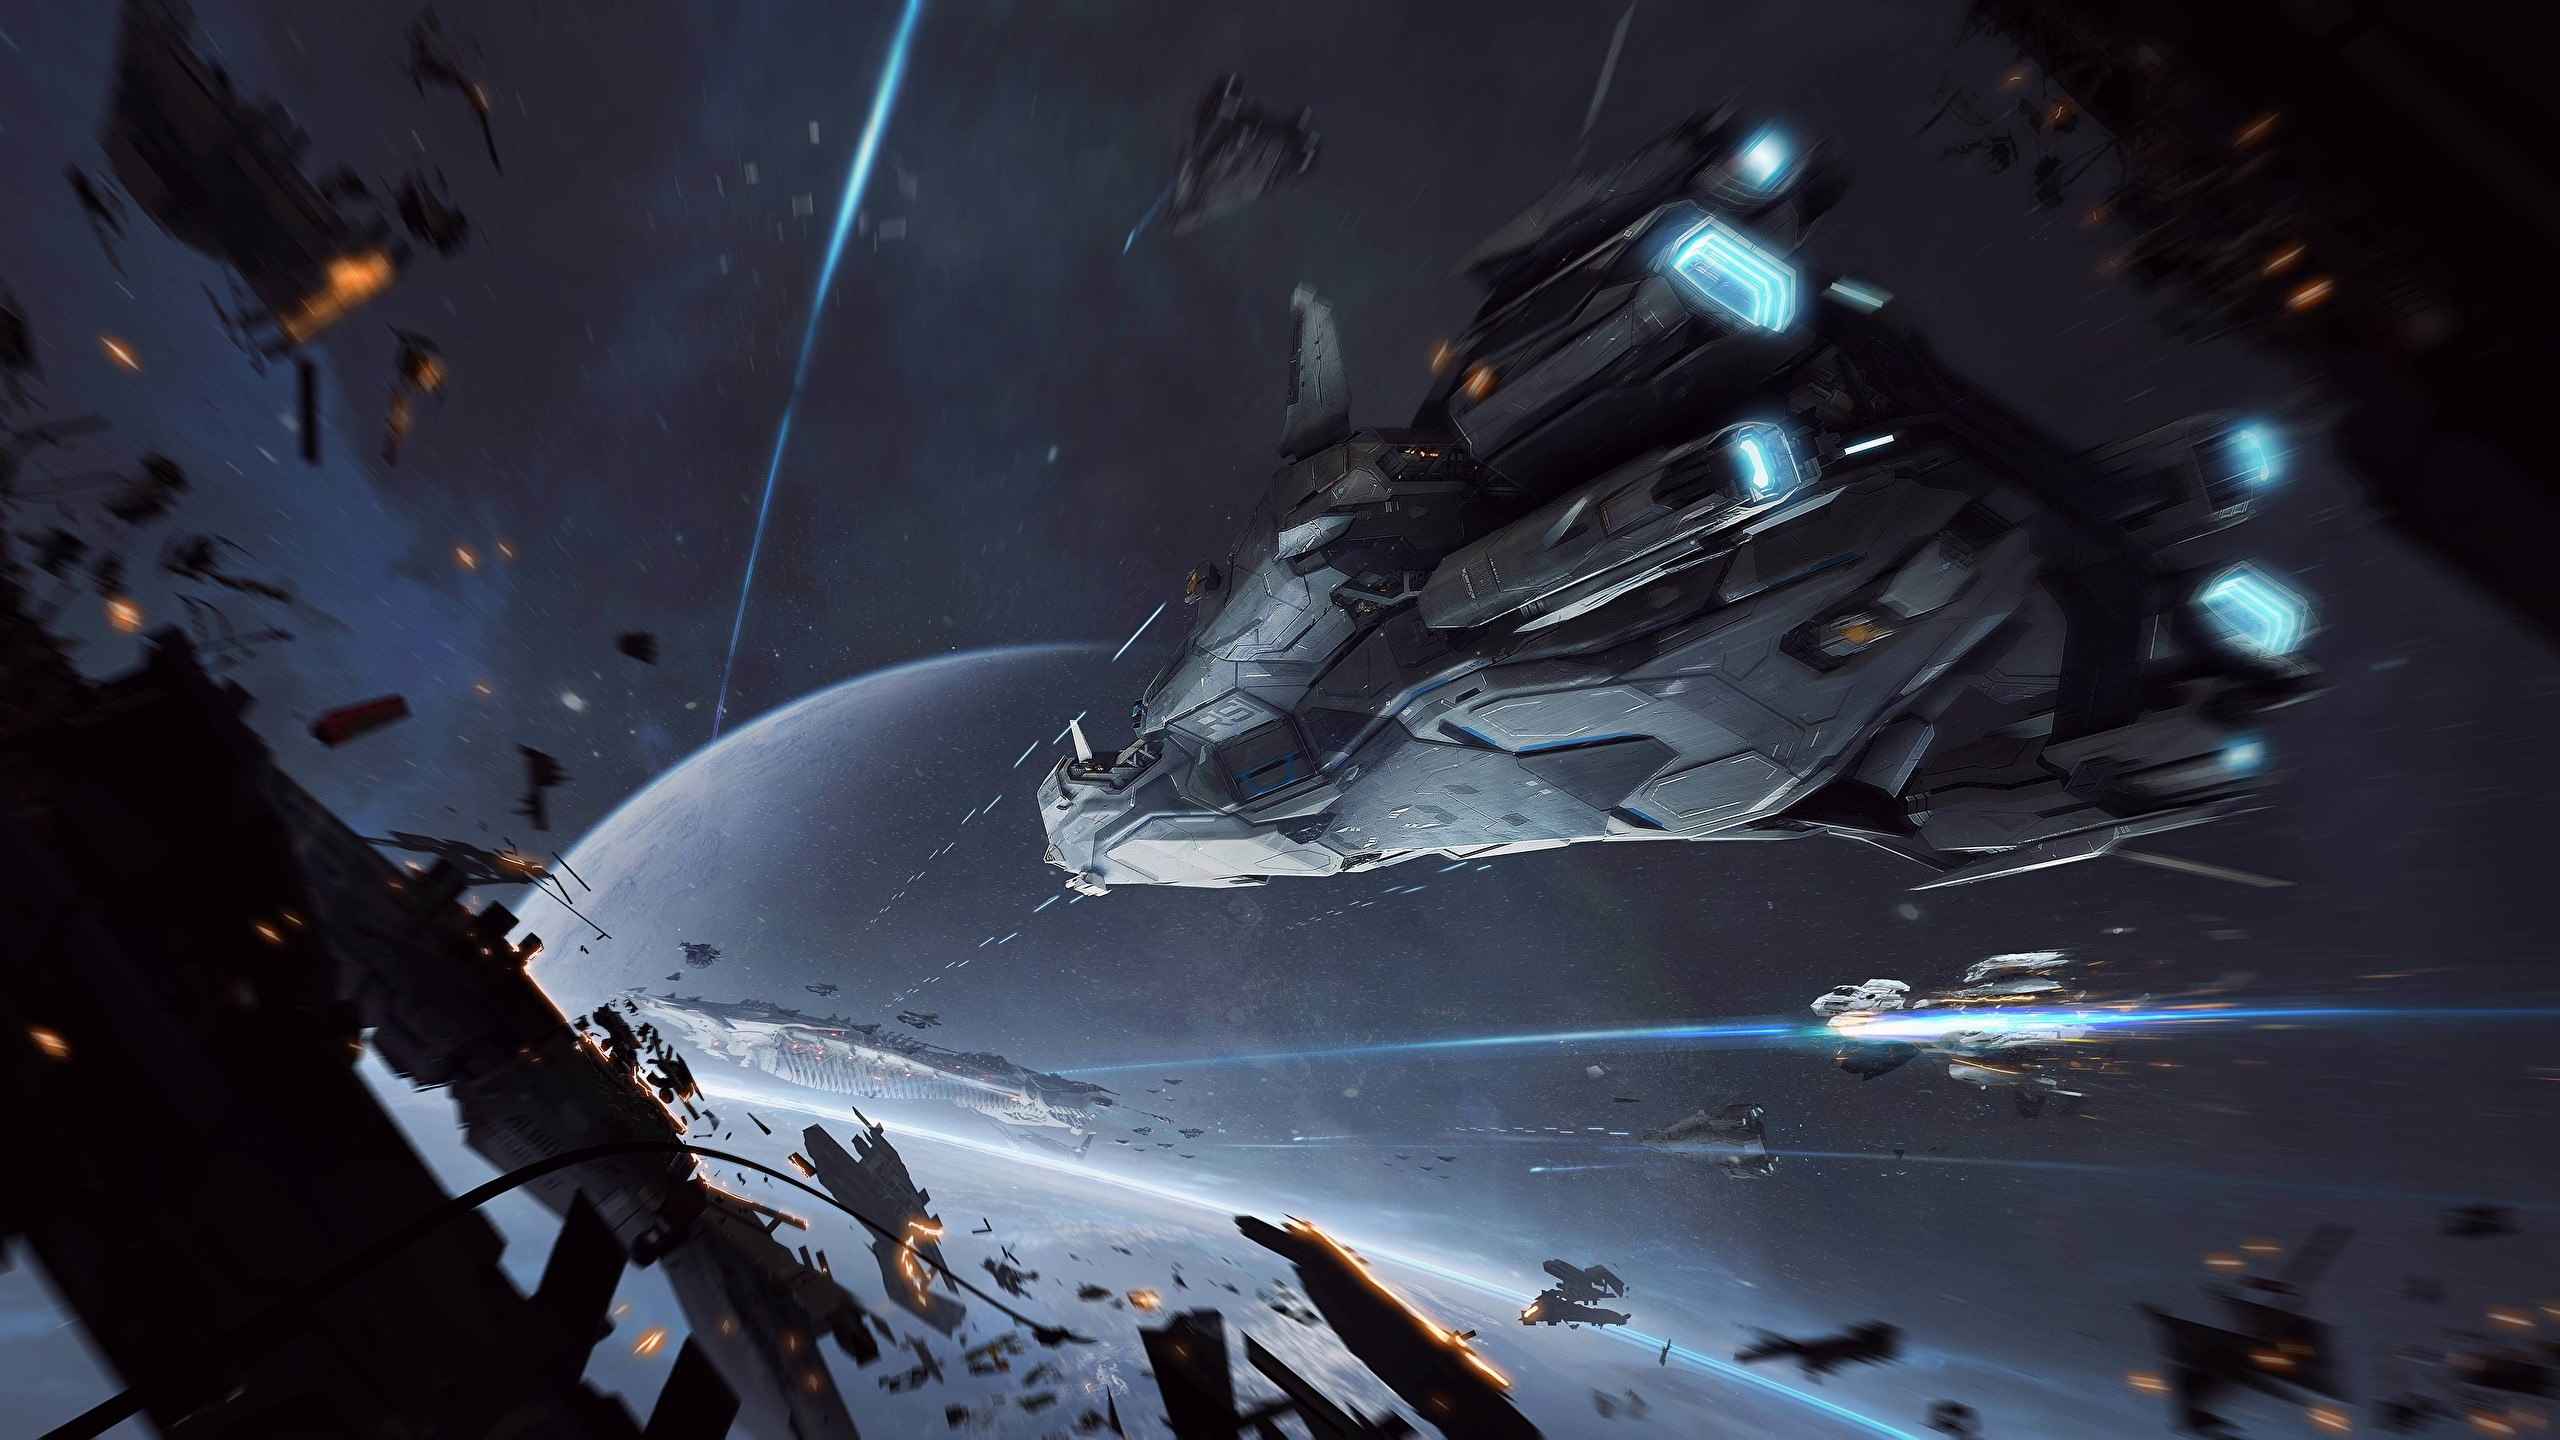 Photo Star Citizen Space Fantasy Games Ships Battles 2560×1440